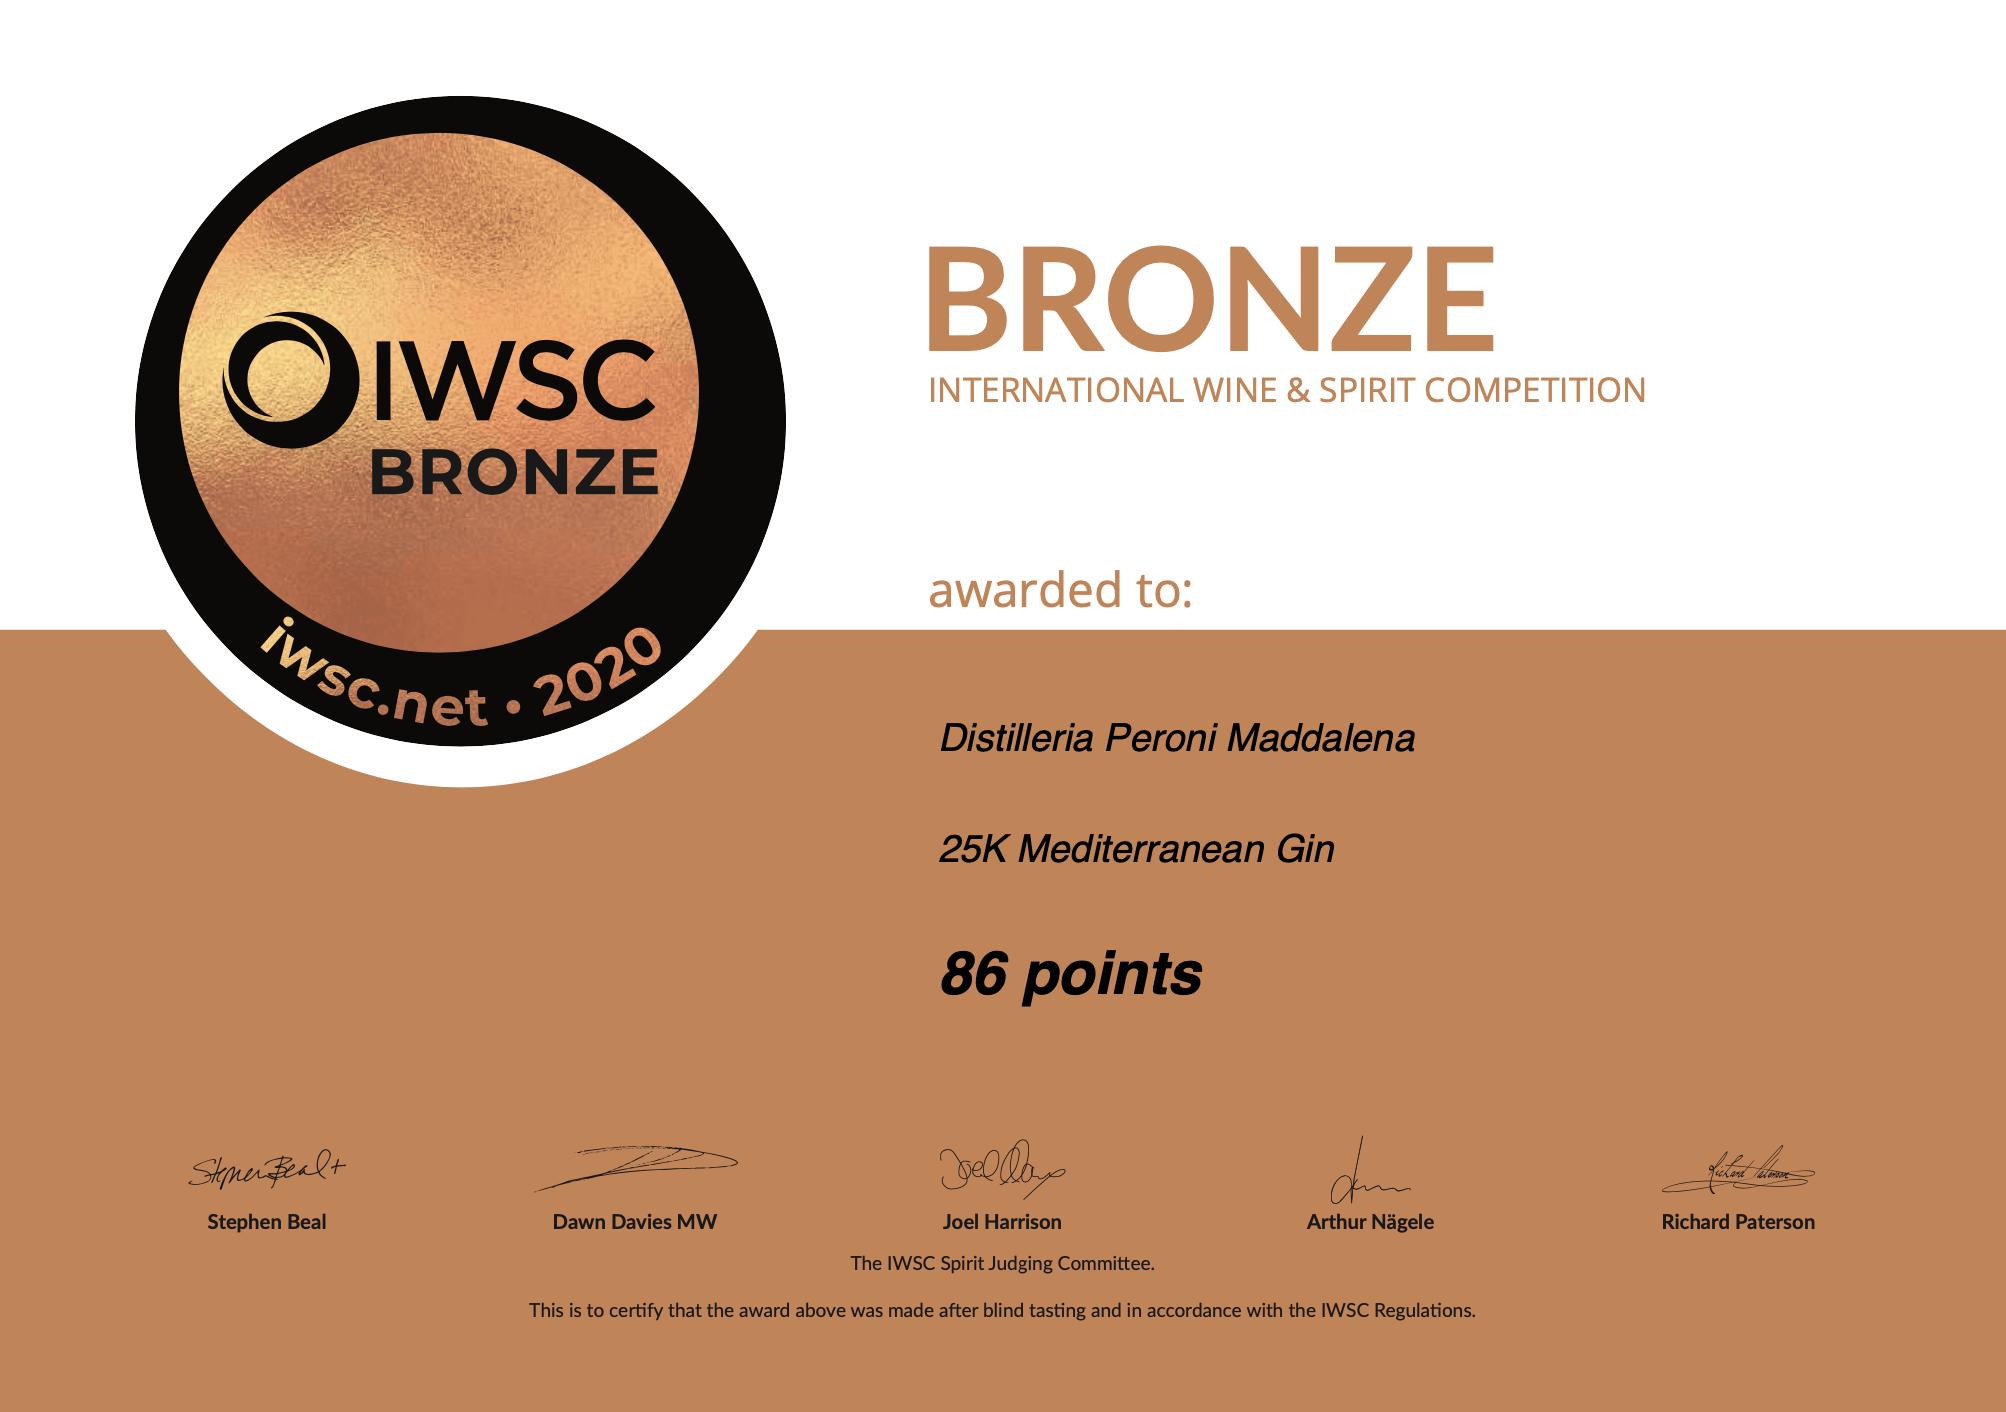 IWSC – Bronze Medal for our 25K Mediterranean Gin